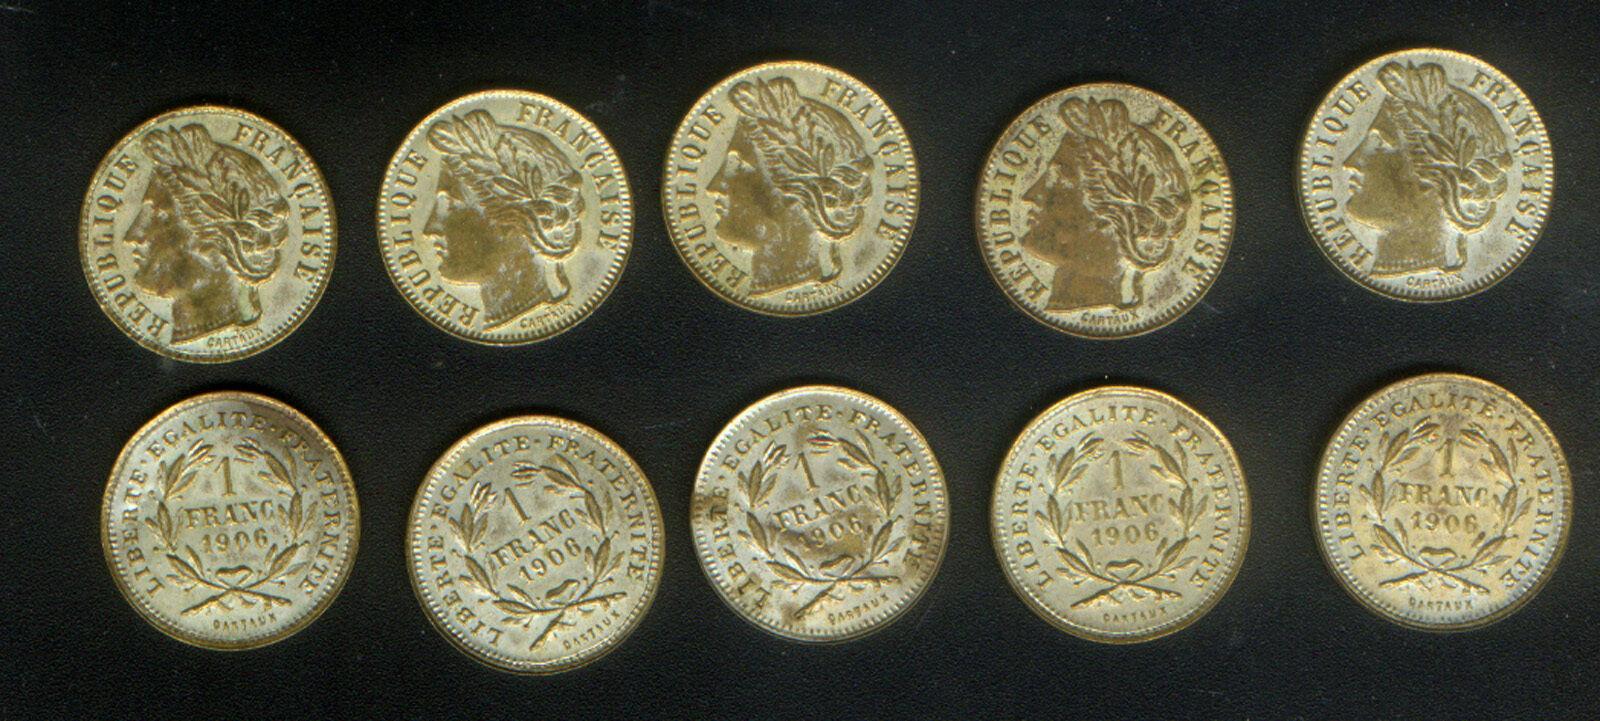 WHOLESALE LOT of FRANCE 10 FANTASY 1 FRANC COINS of 1906 FIBER - METAL CARTAUX